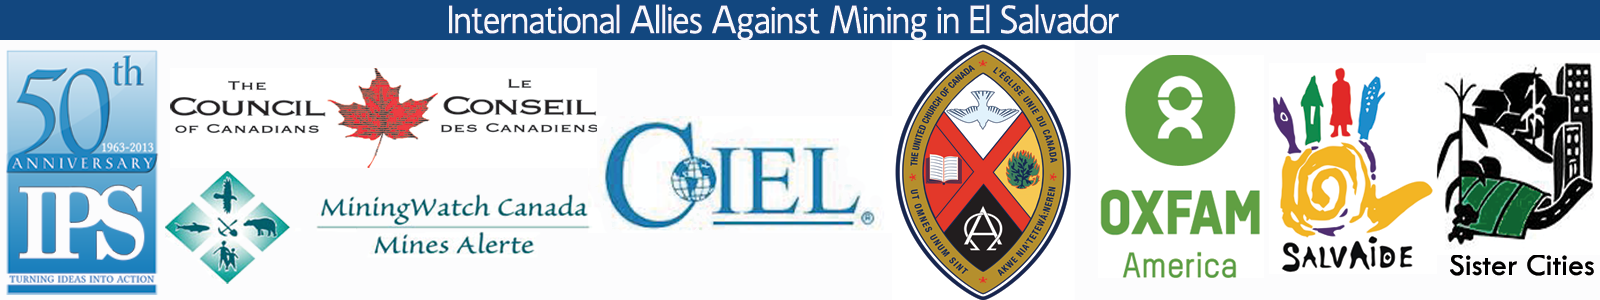 logos letter ICSID